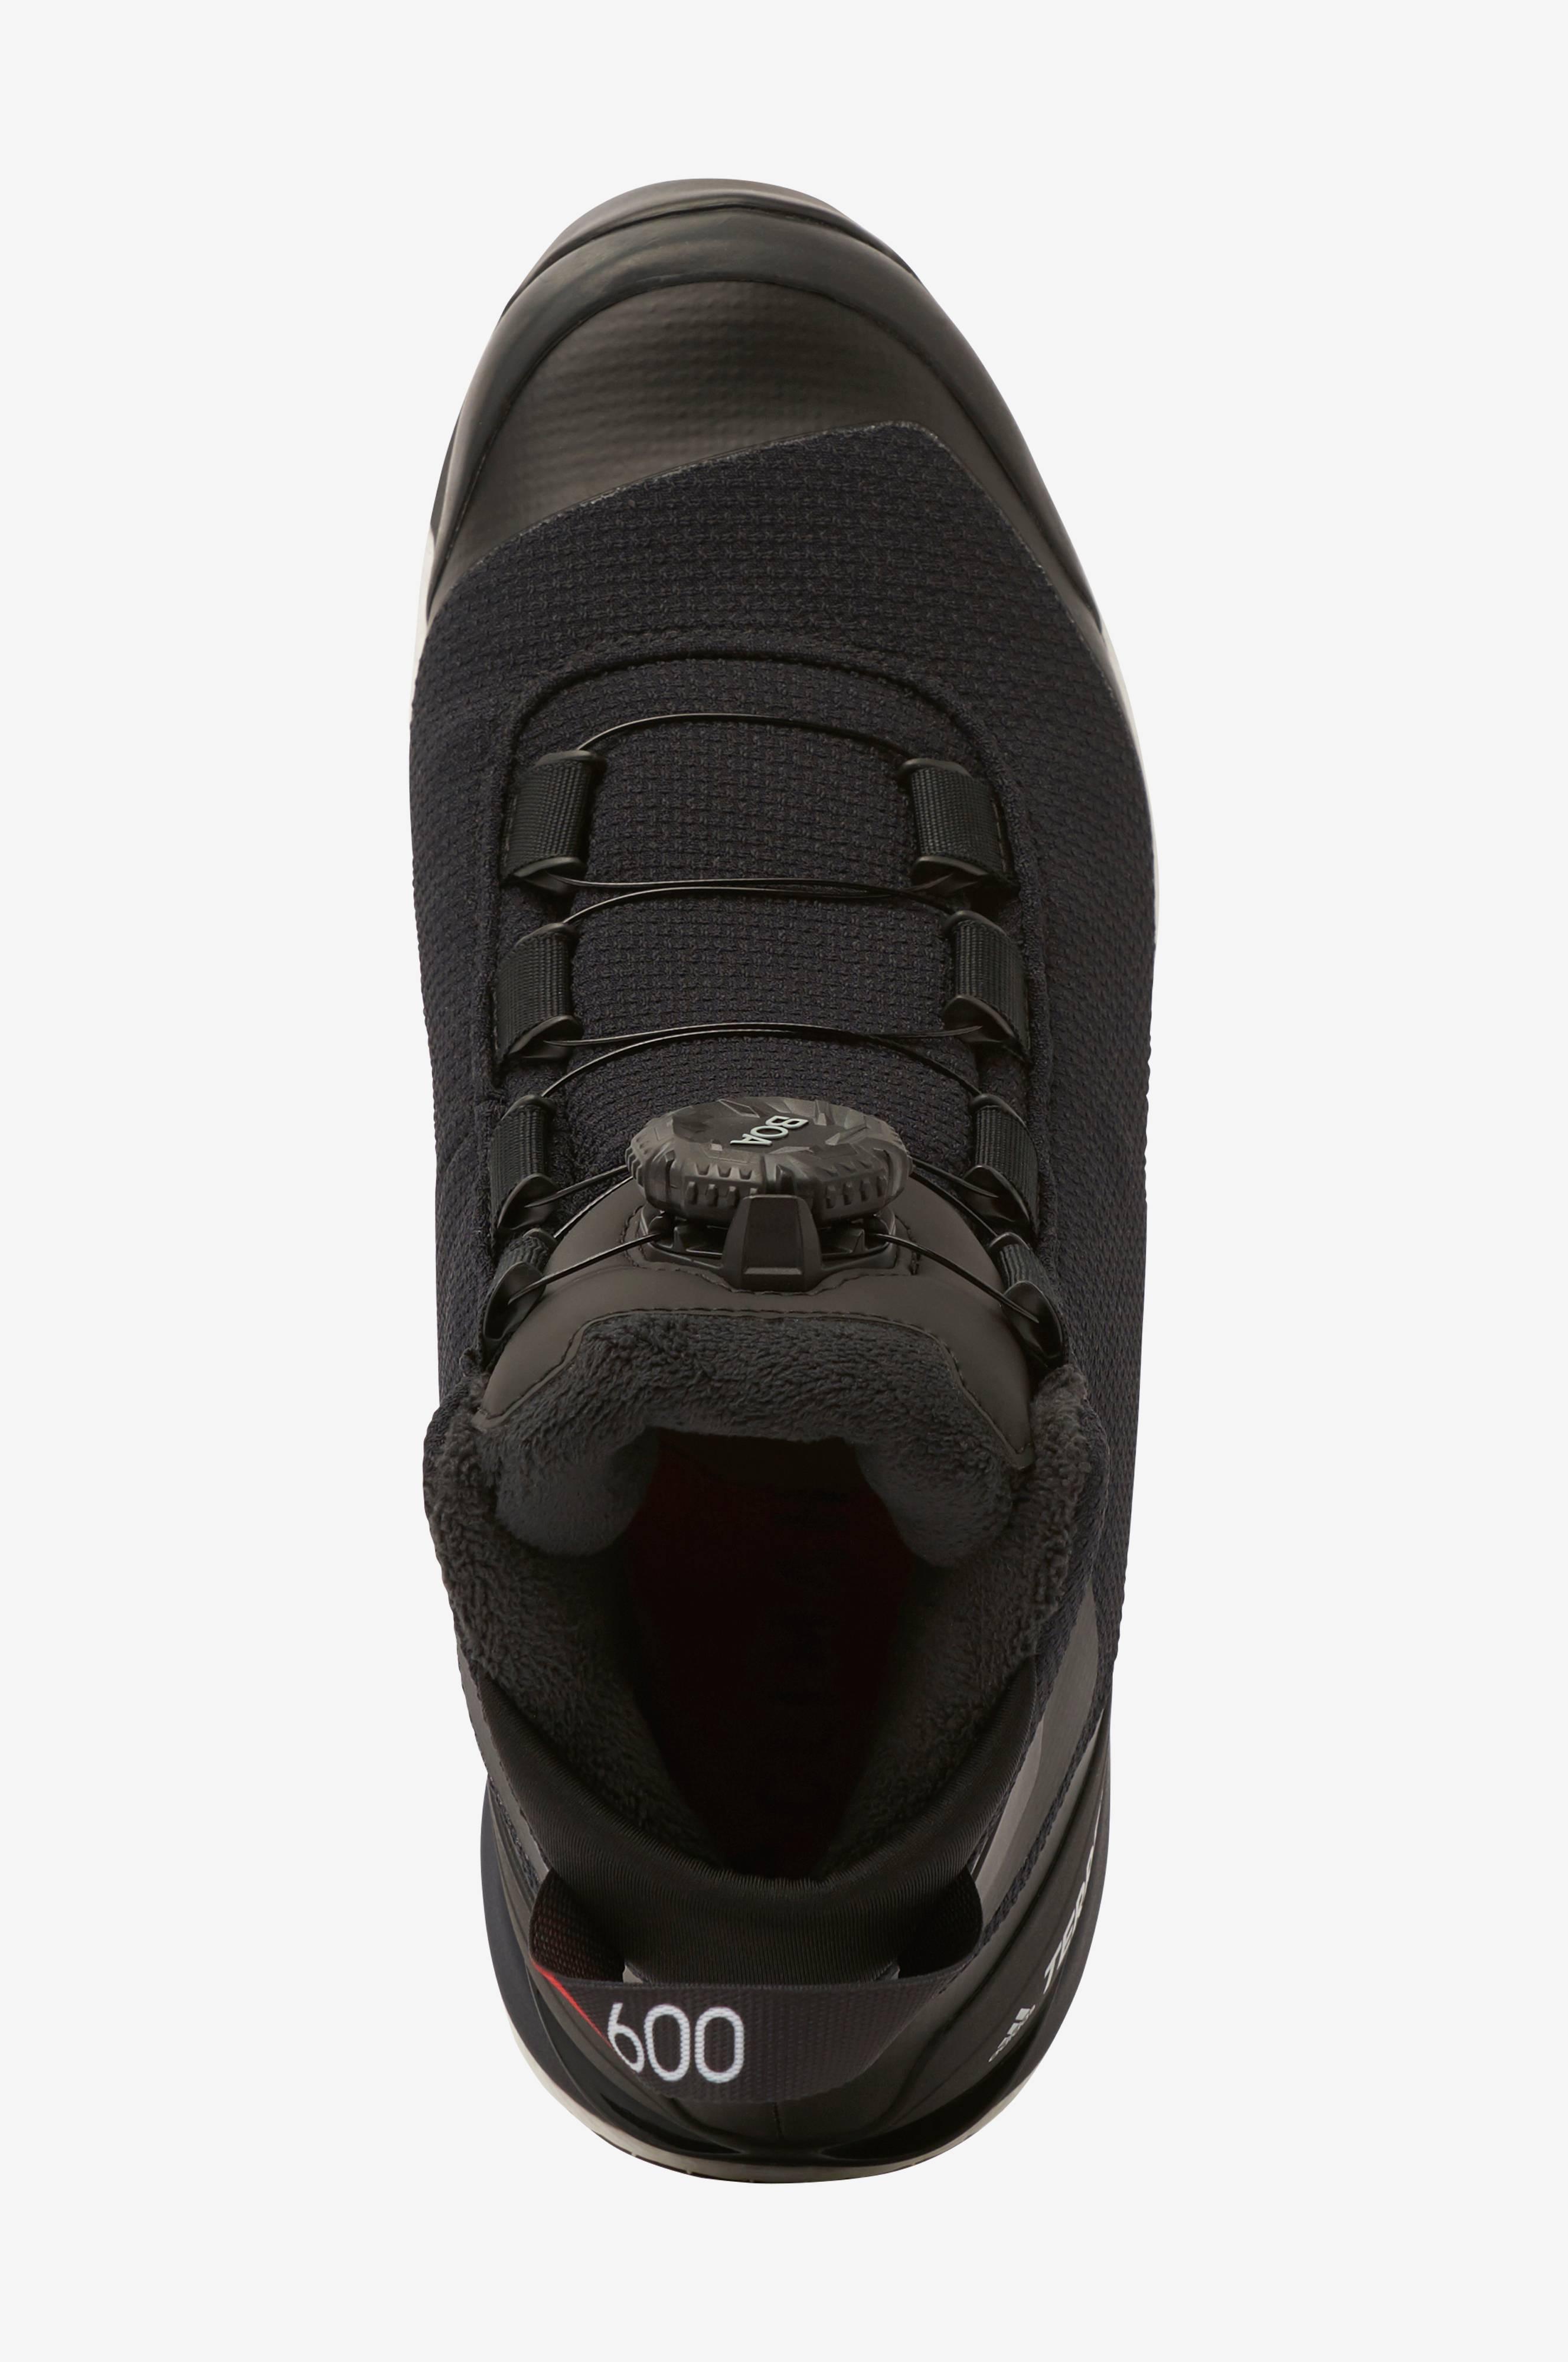 Terrengstøvler Terrex Conrax Climaheat Boa Shoes